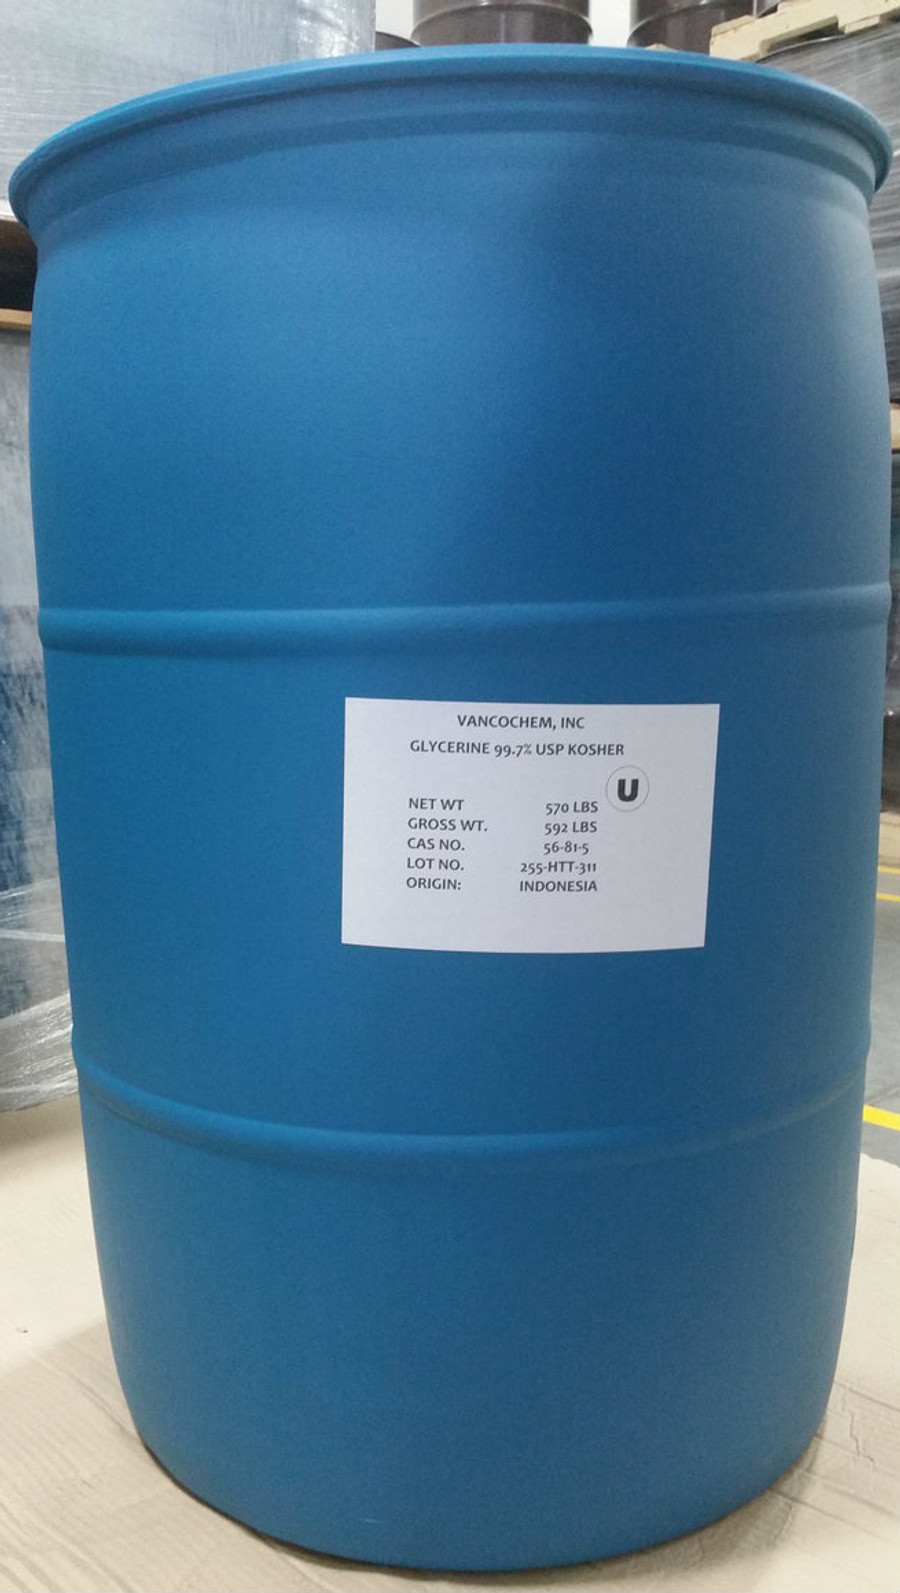 99.7% USP Kosher NonGMO Palm Glycerin ($0.88/lb 55 gallons 570# net in POLY drum) ISO cGMP